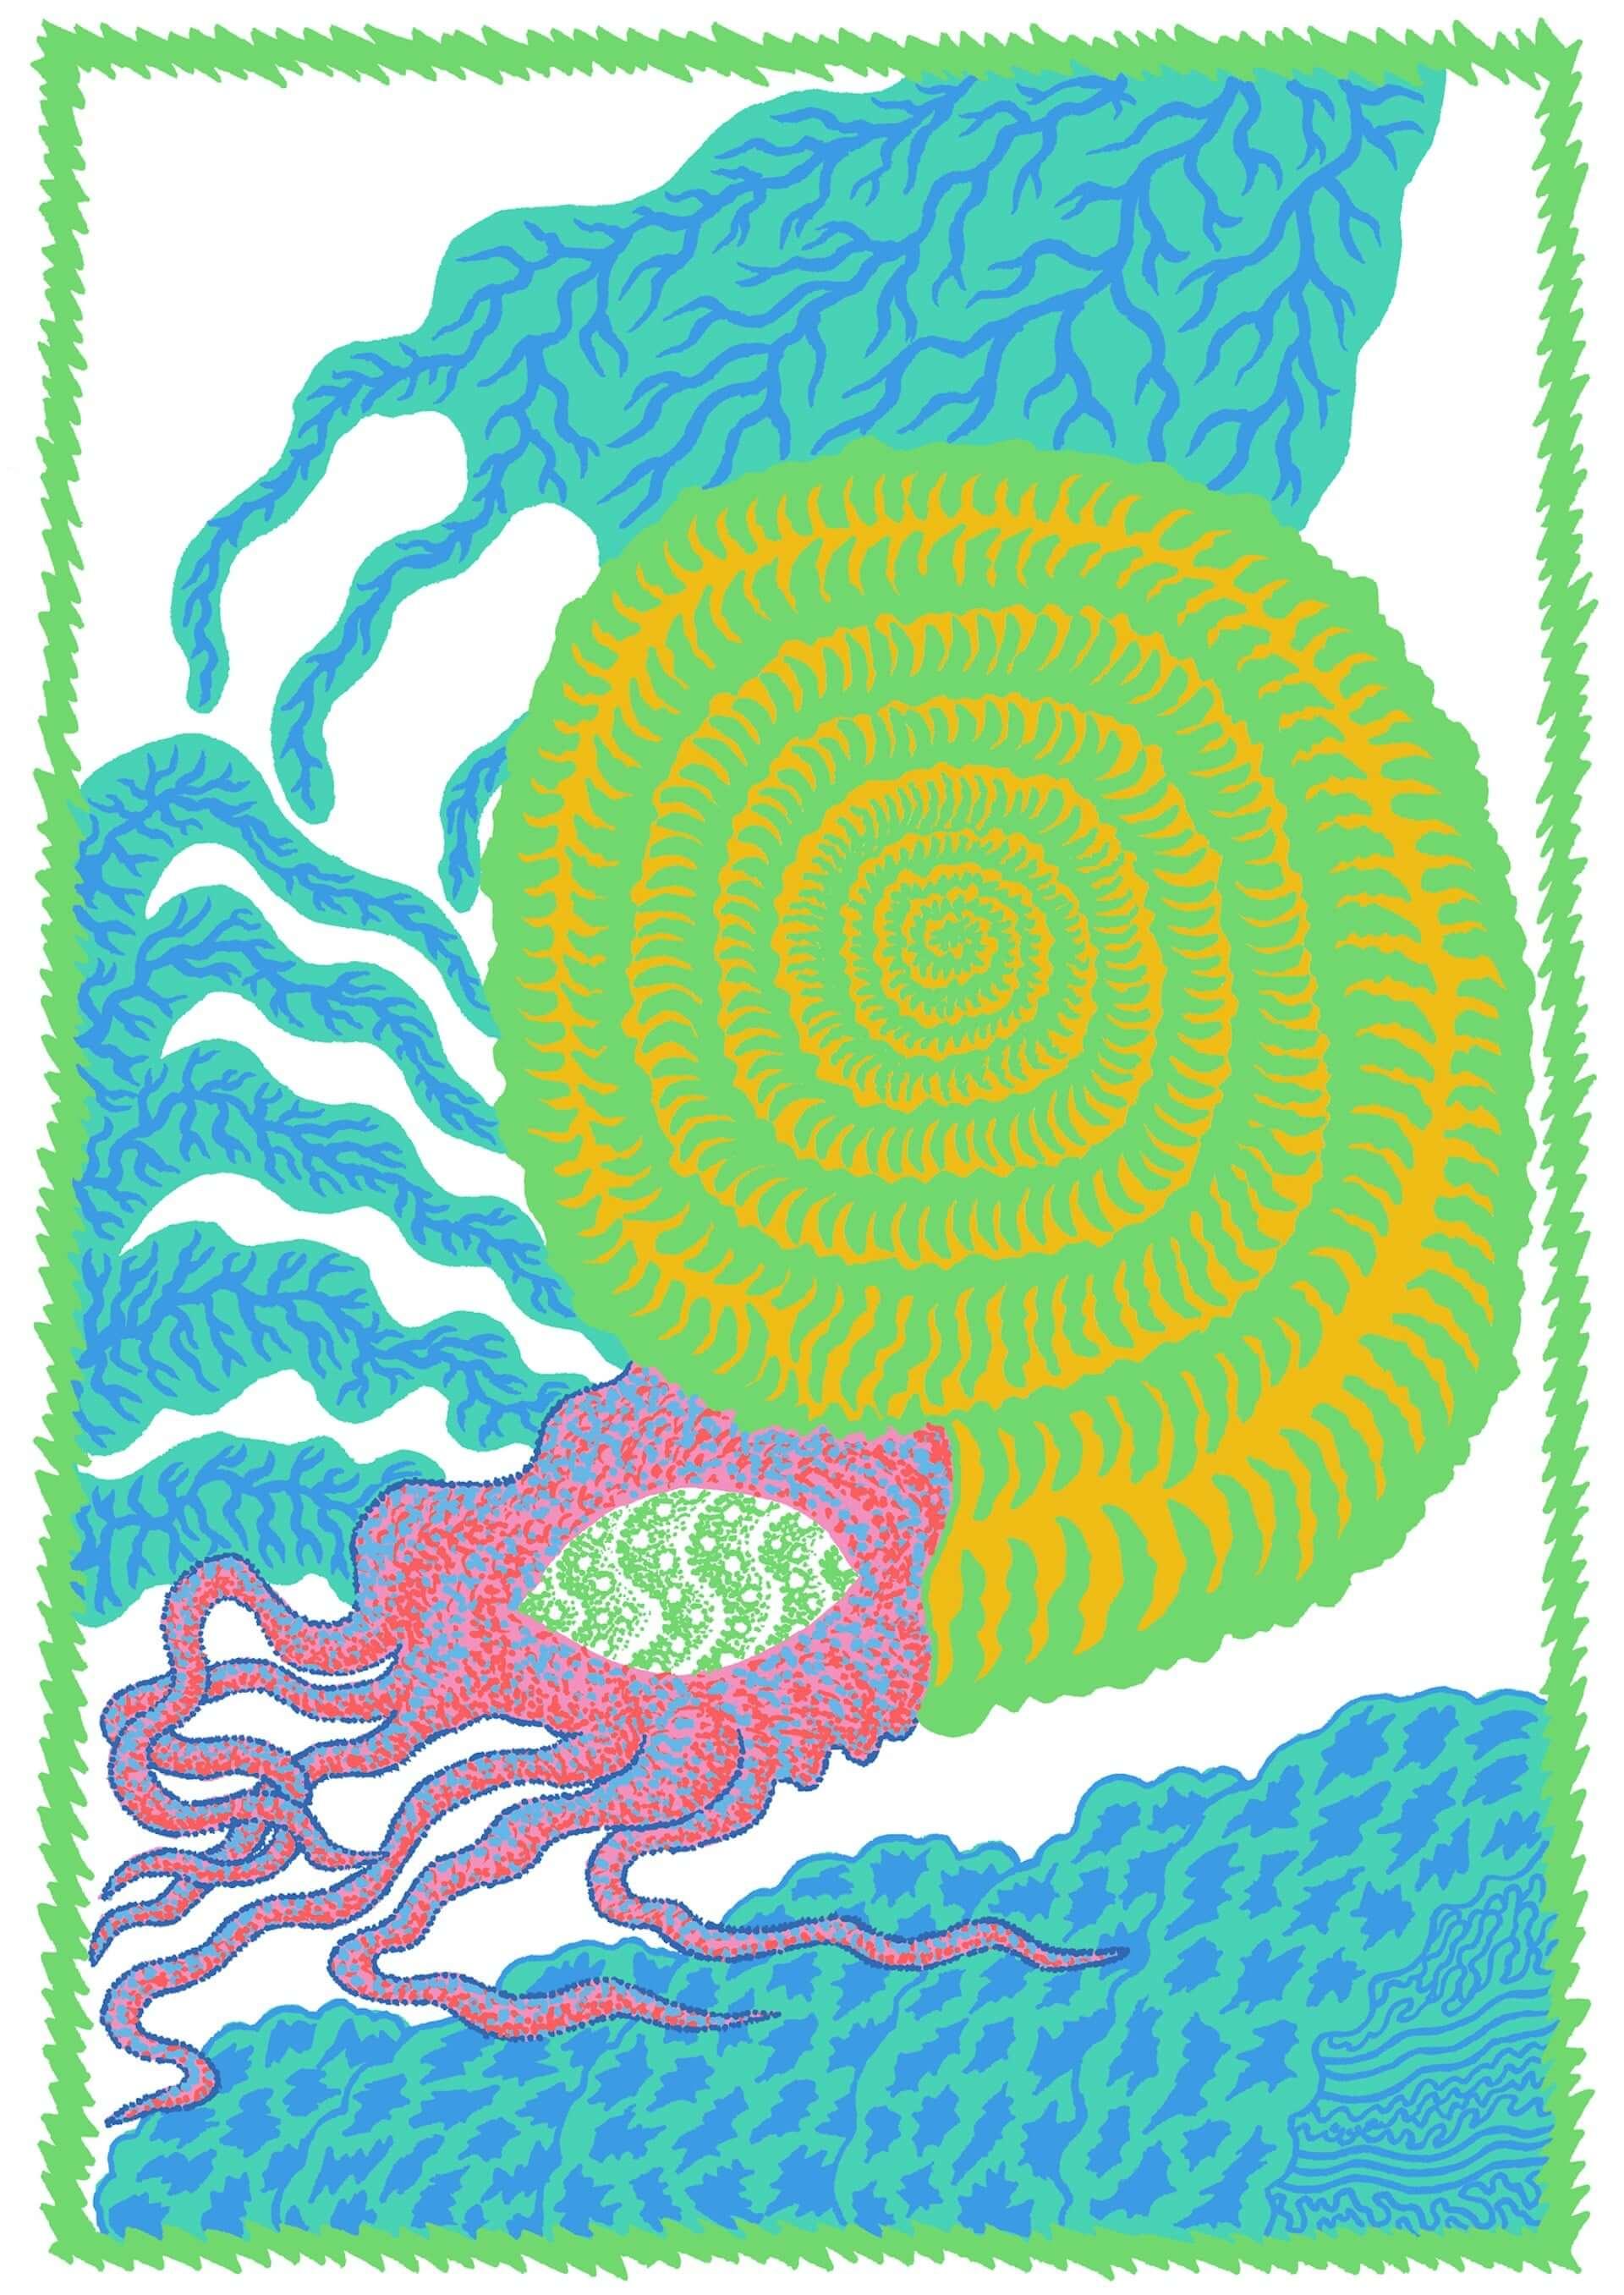 TETSUNORI TAWARAYAのアート展が「RVCA STORE SHIBUYA Gallery」にて開催決定!アーカイブ作品など期間限定で展示 art201125_tetsunori-tawaraya_12-1920x2713